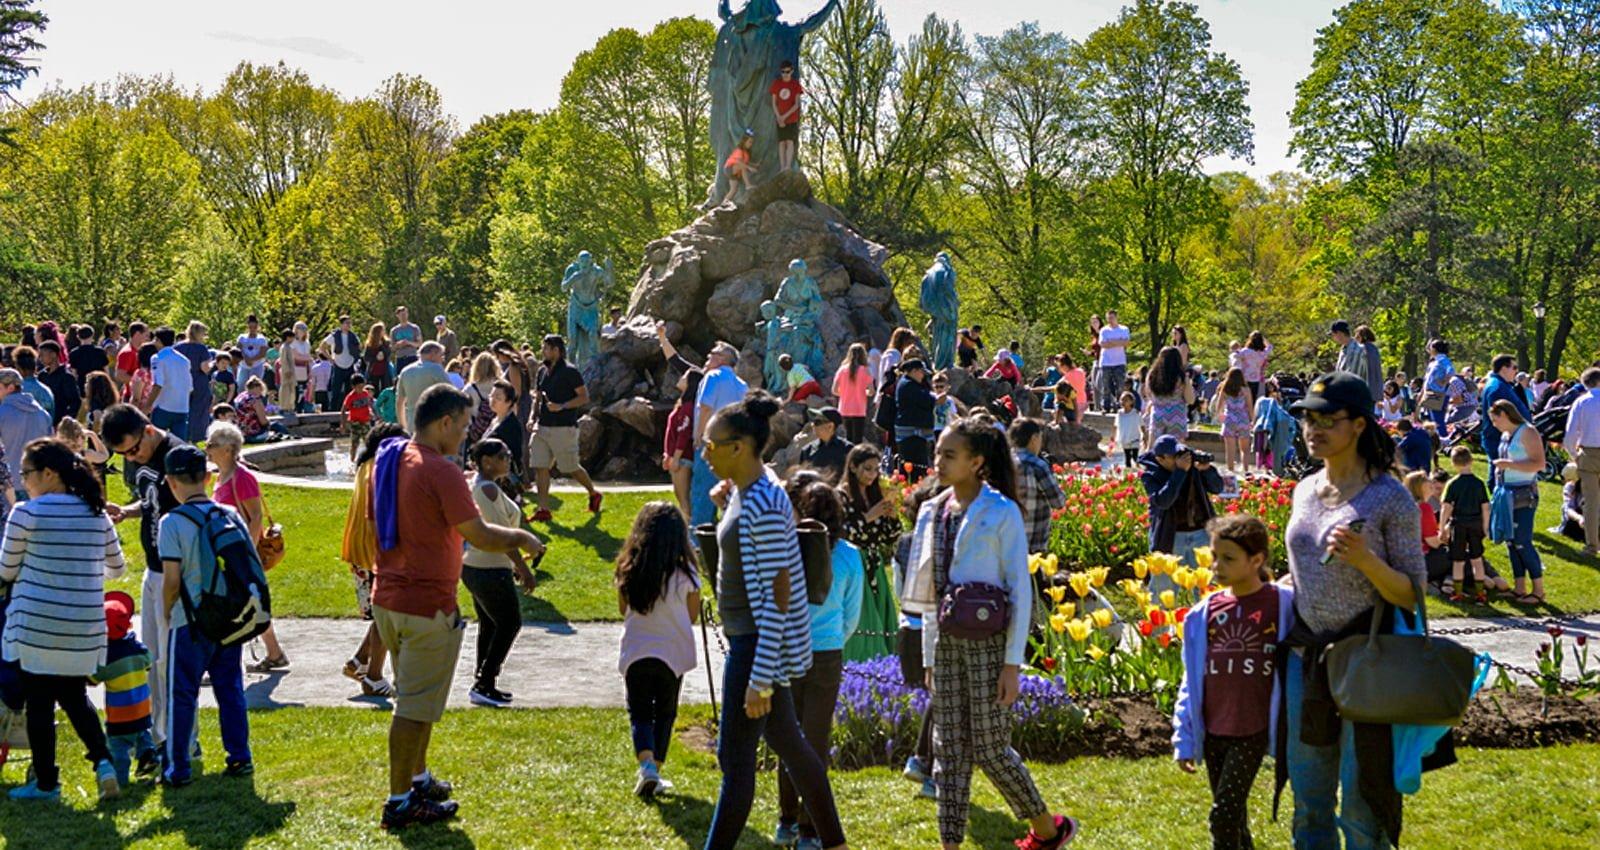 Albany Tulip Festival | Photo Courtesy of Andrzej Pilarczyk